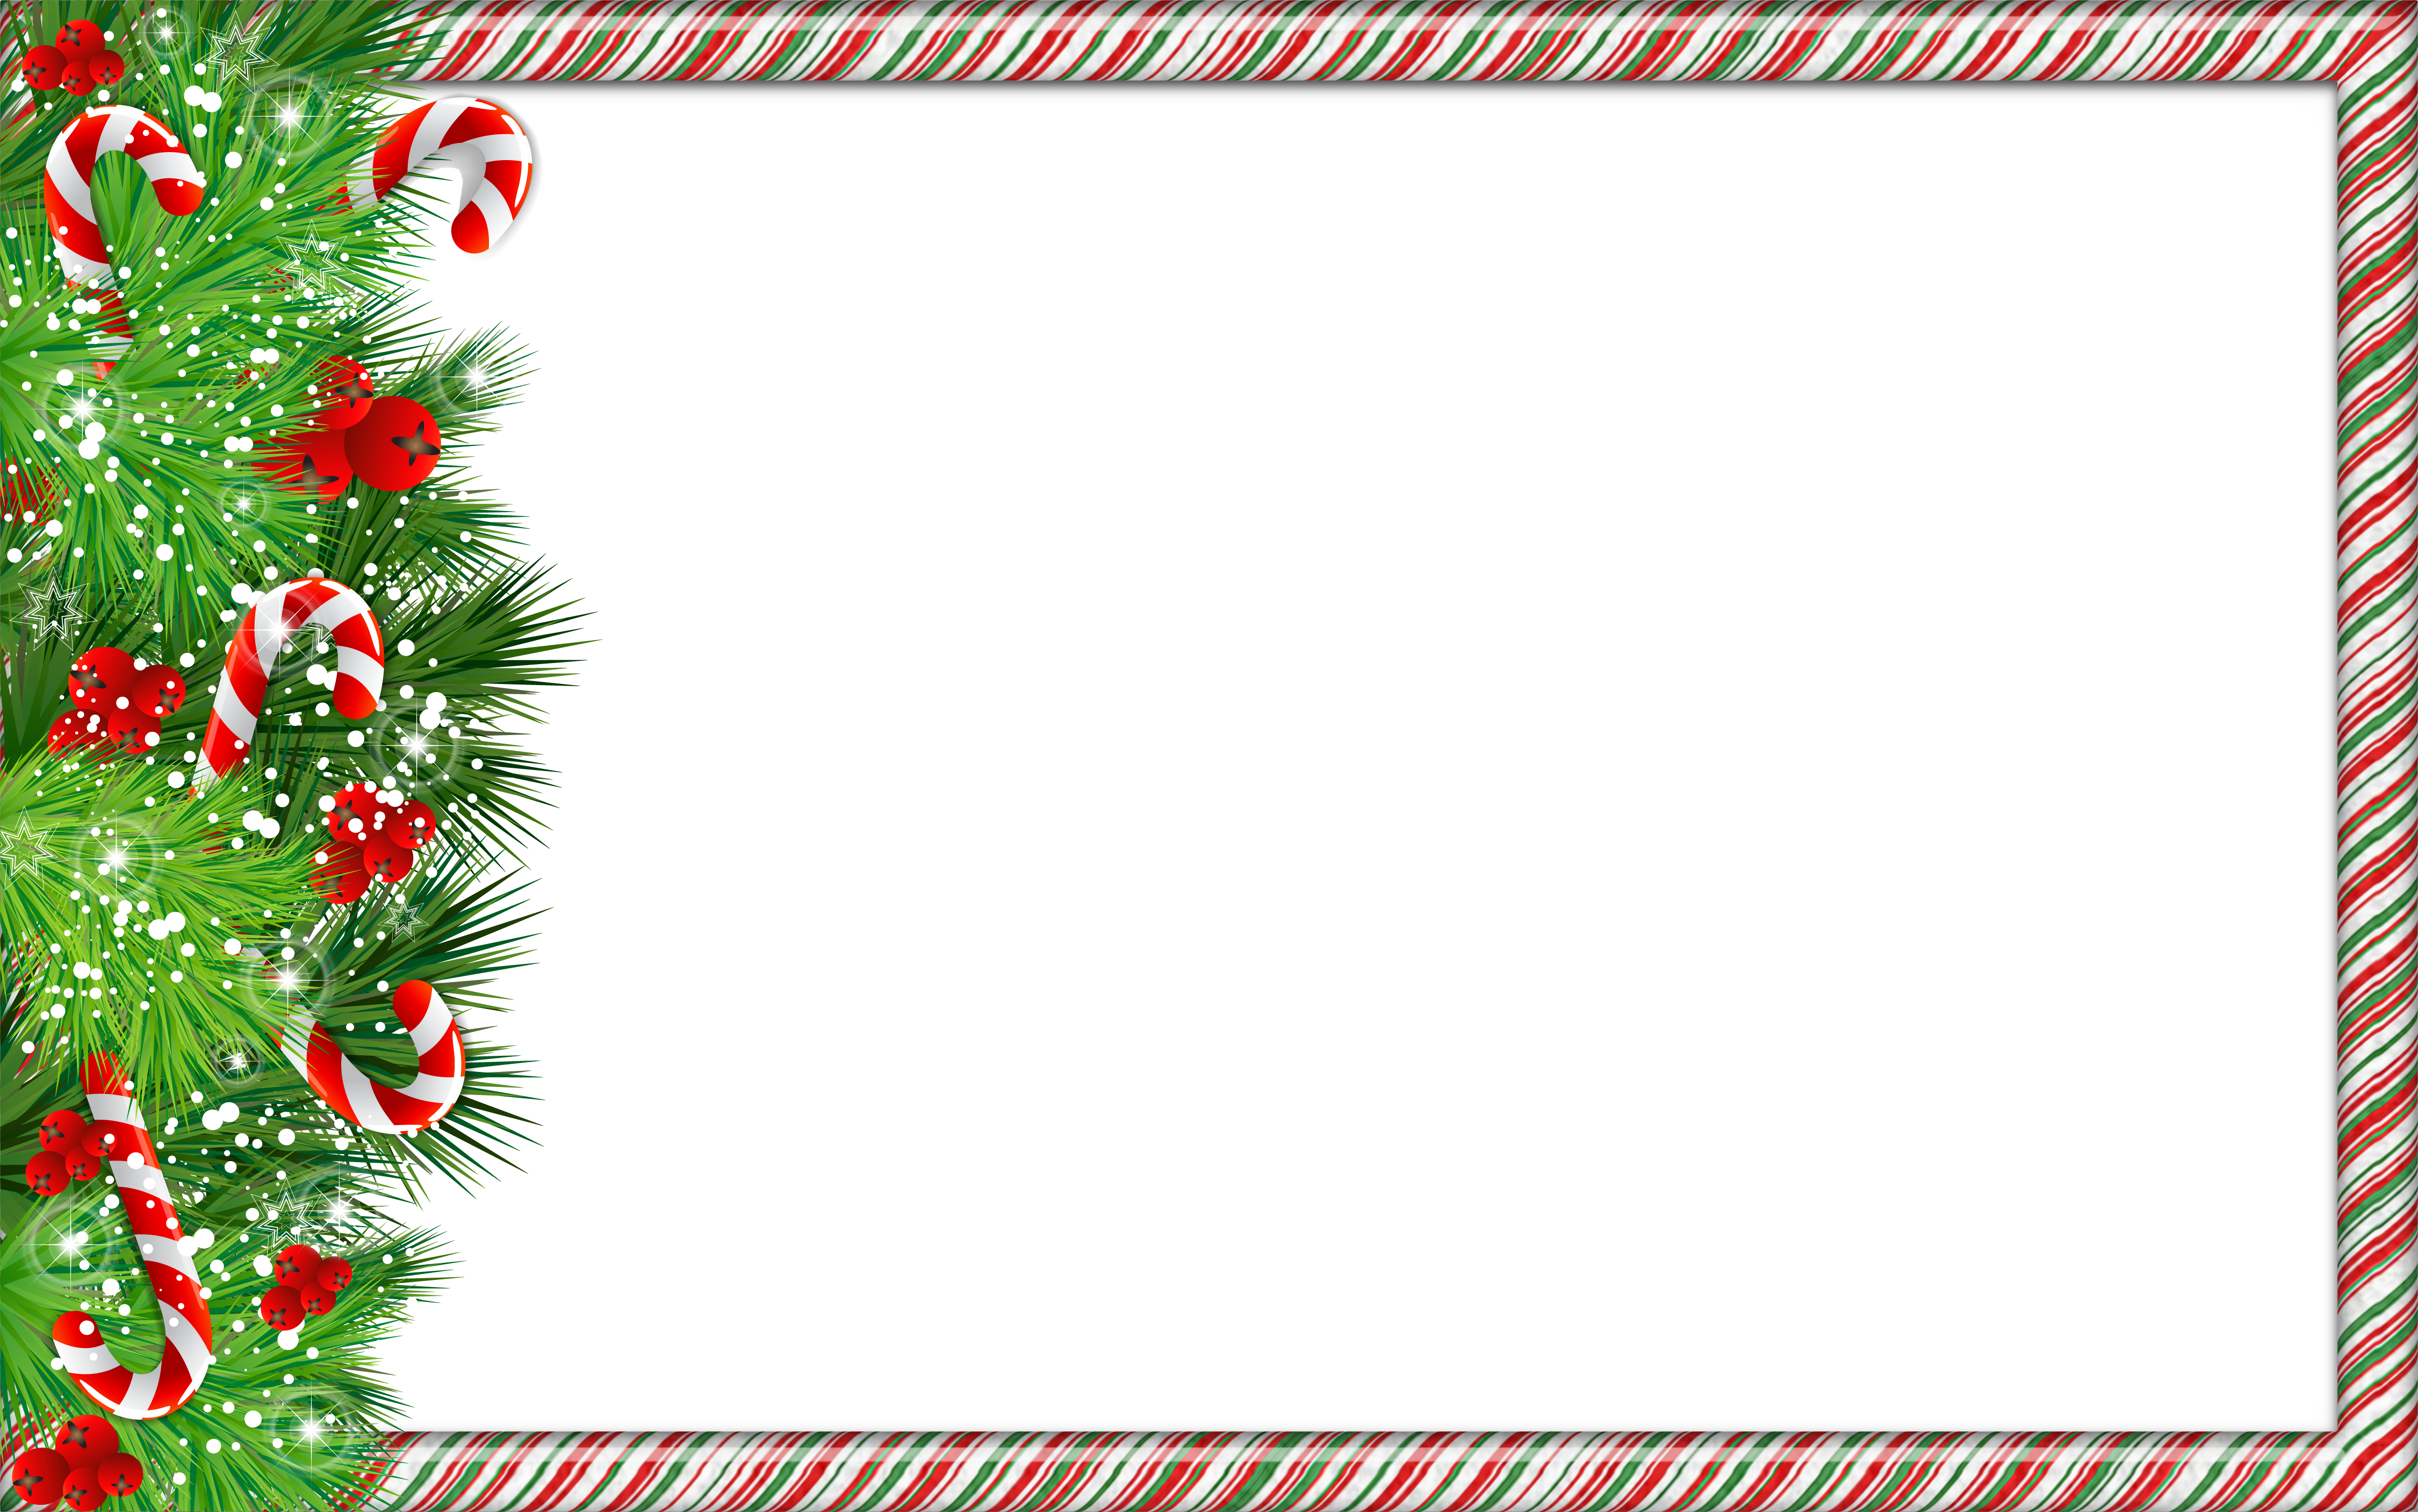 1000  images about Christmas Frames u002-1000  images about Christmas Frames u0026amp; Wallpaper on Pinterest | Playboy, Hd wallpaper and Christmas wallpaper-15